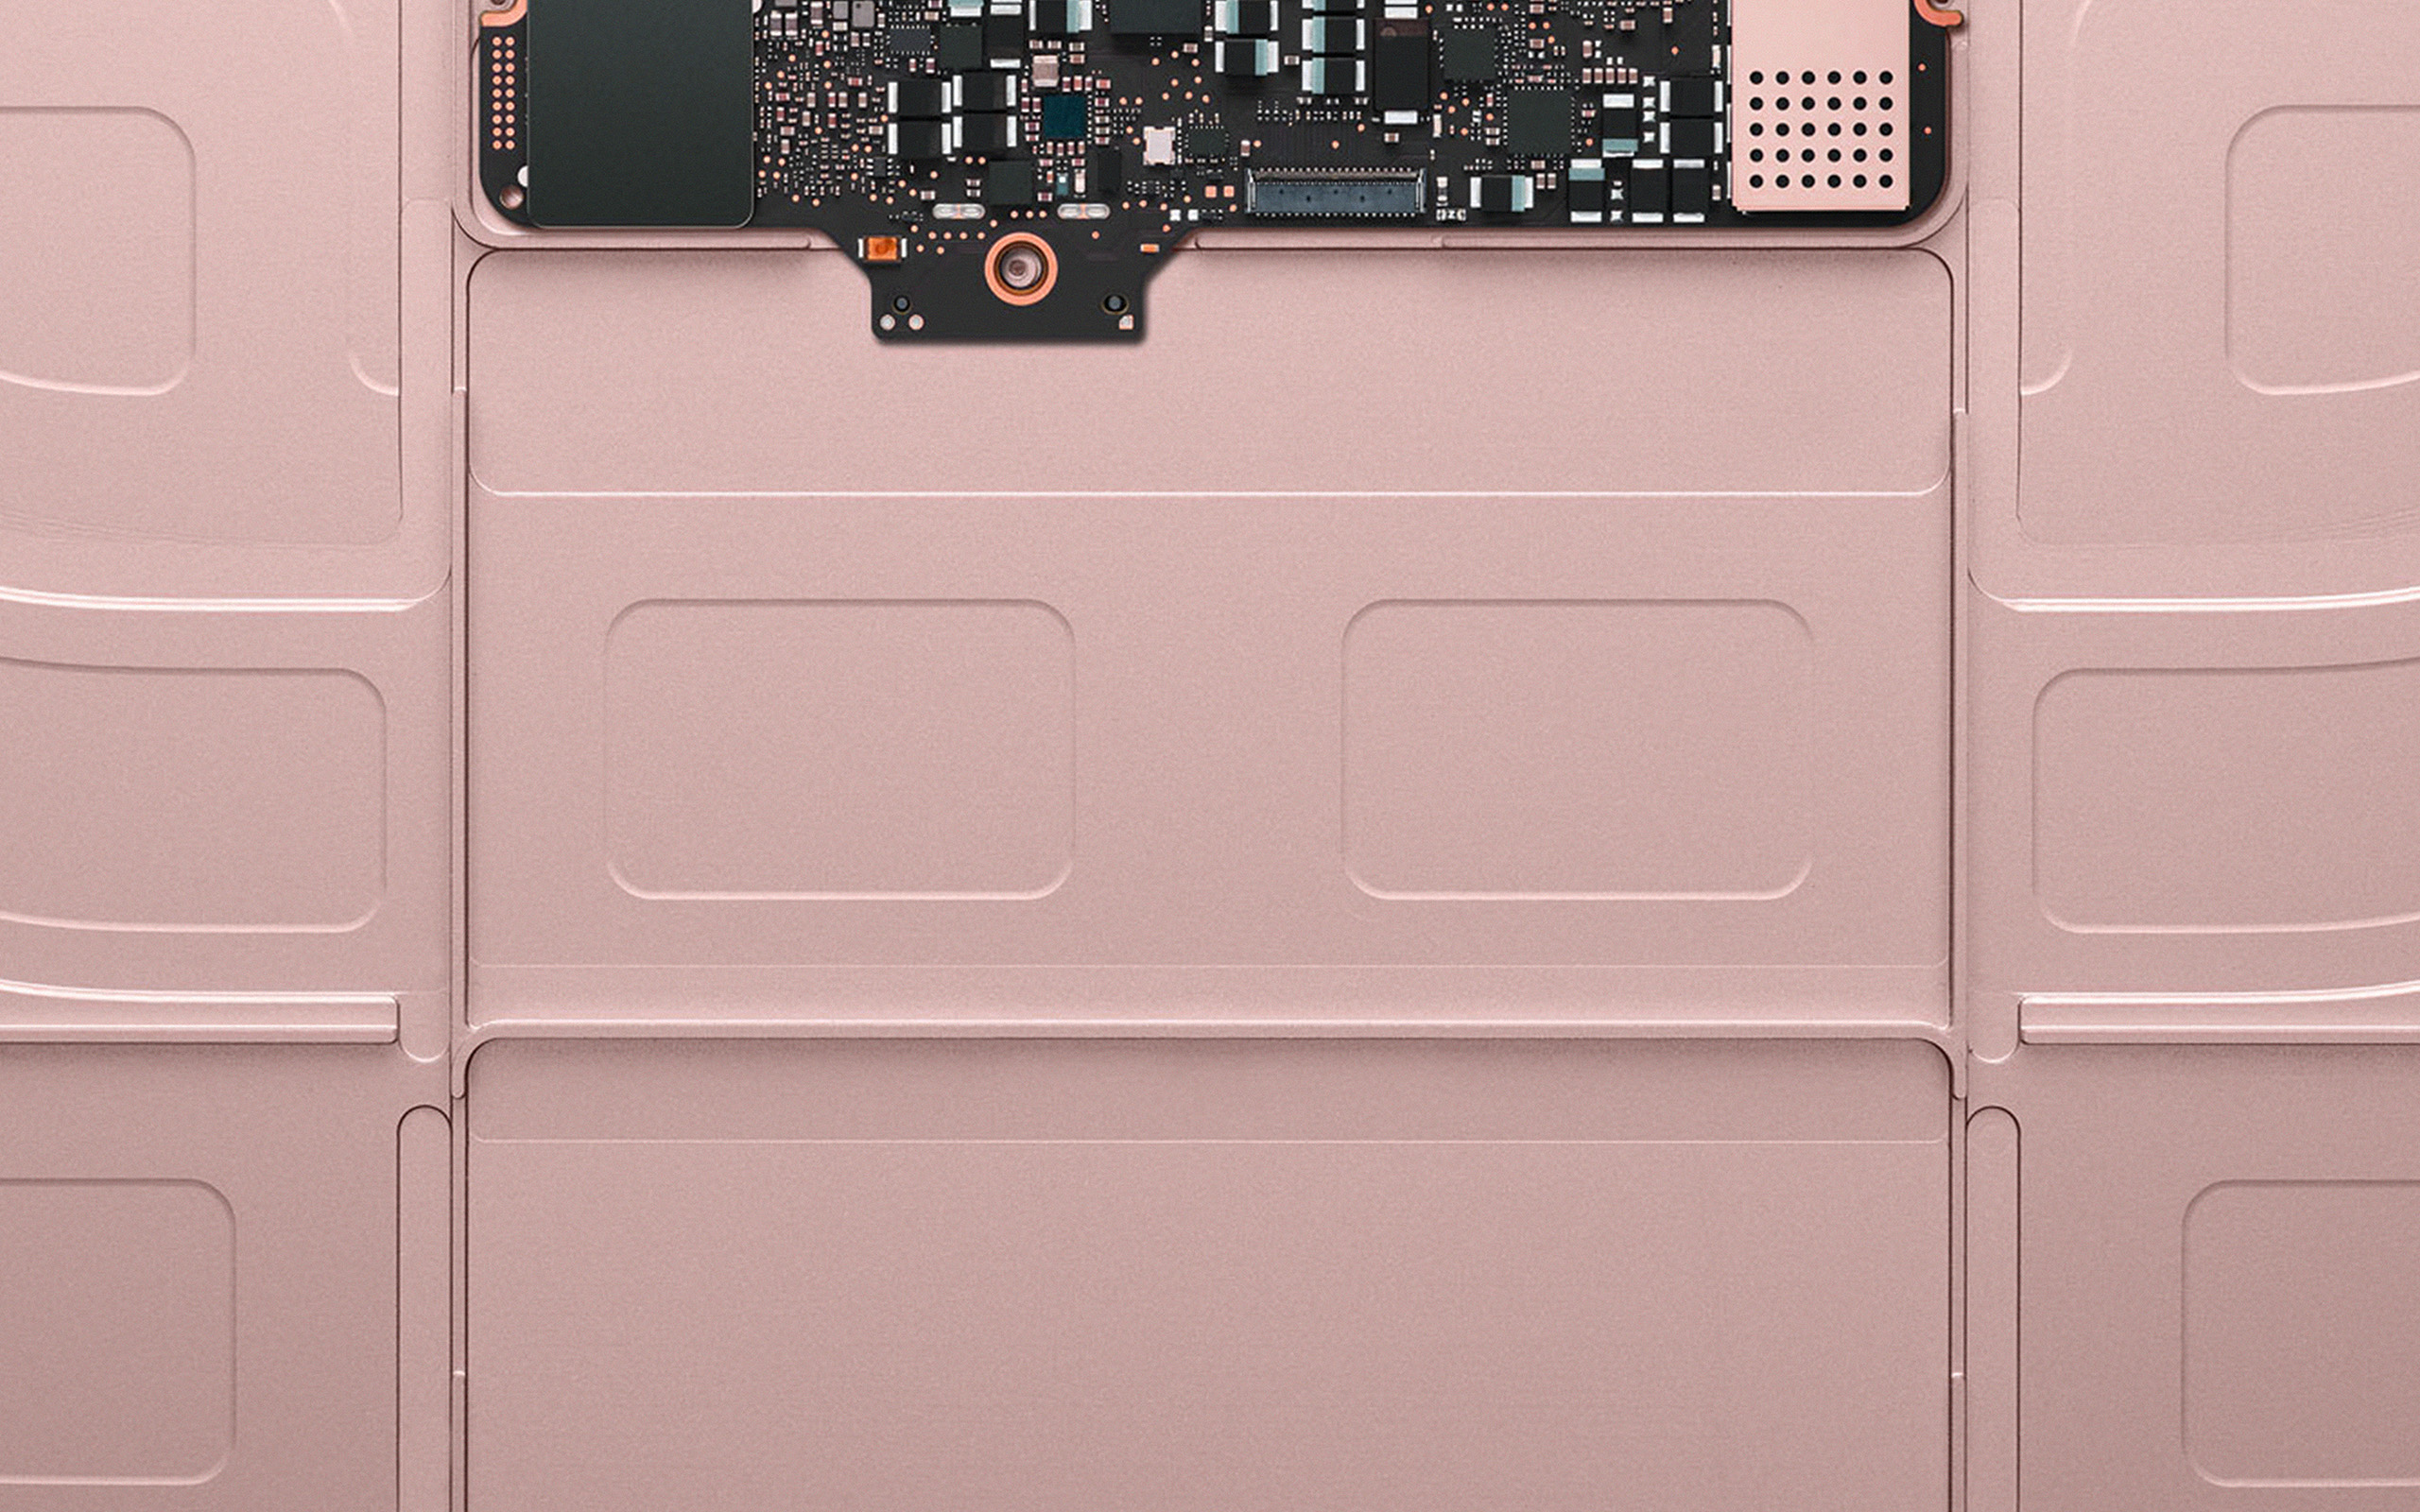 Lg Optimus Wallpaper Hd Au53 Inside Macbook Gold Apple Illustration Art Rose Gold